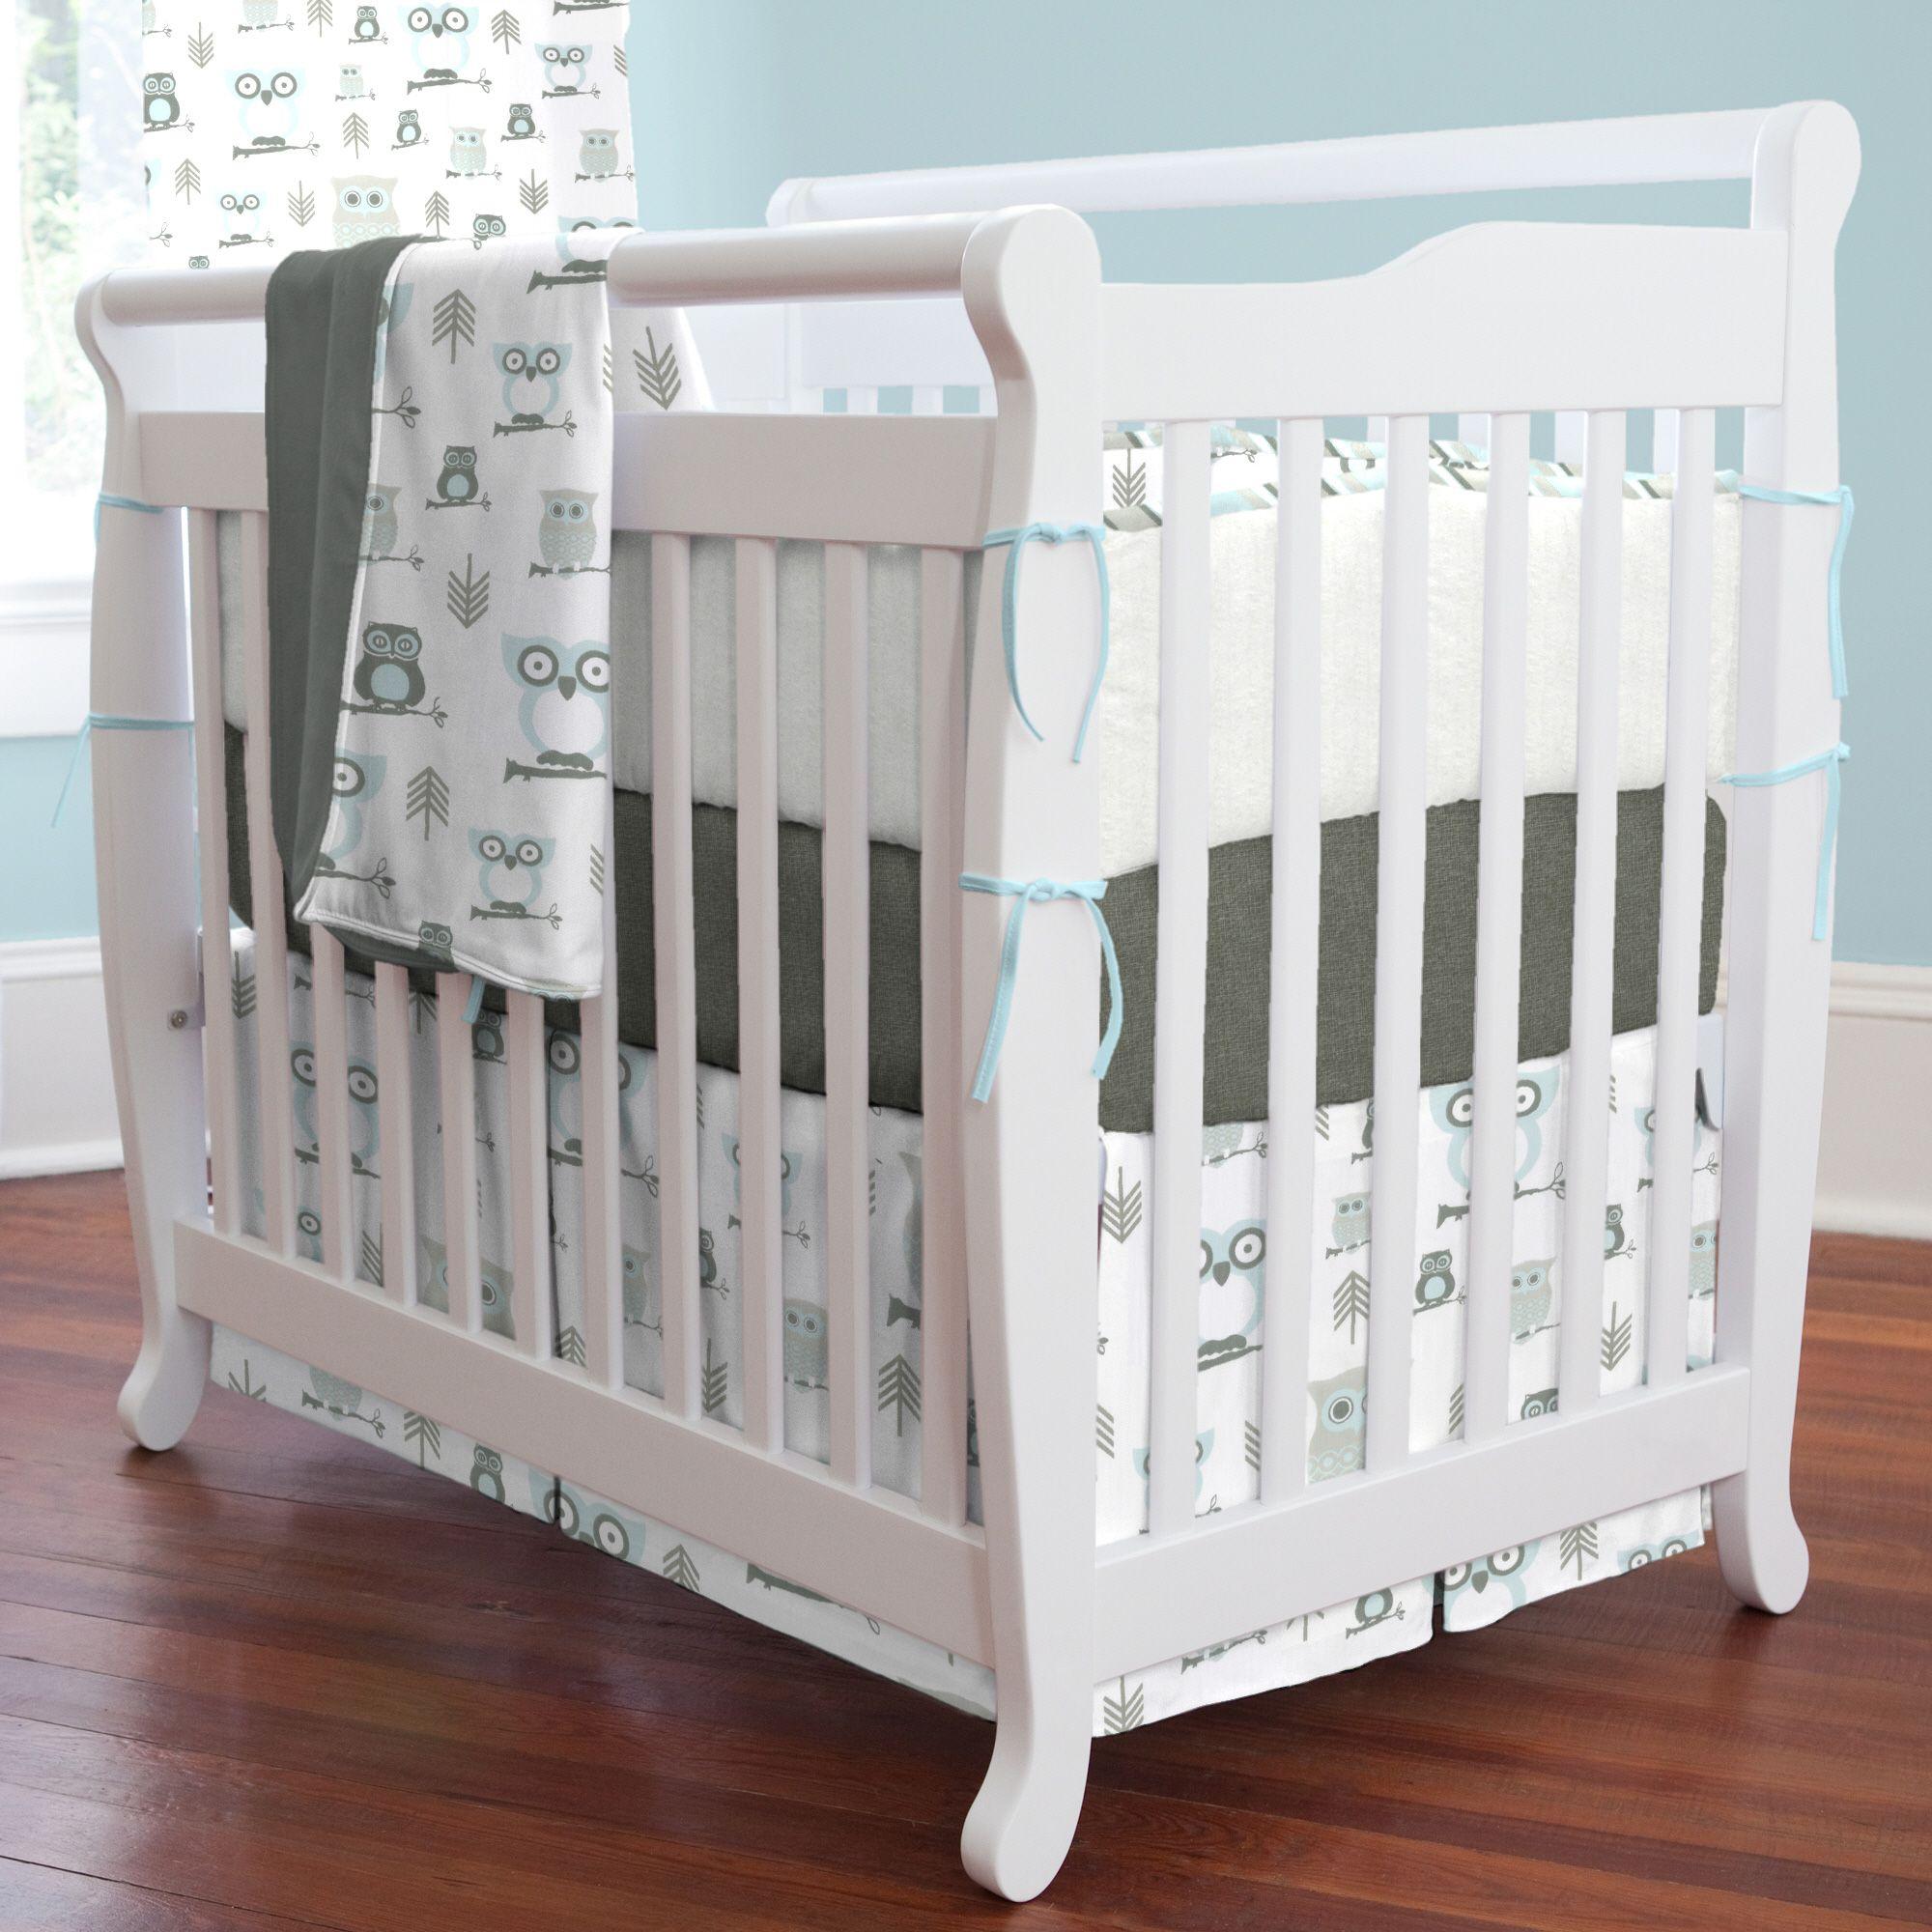 Mist And Gray Owls Mini Crib Bedding Carouseldesigns Mini Crib Bedding Mini Crib Crib Bedding Sets